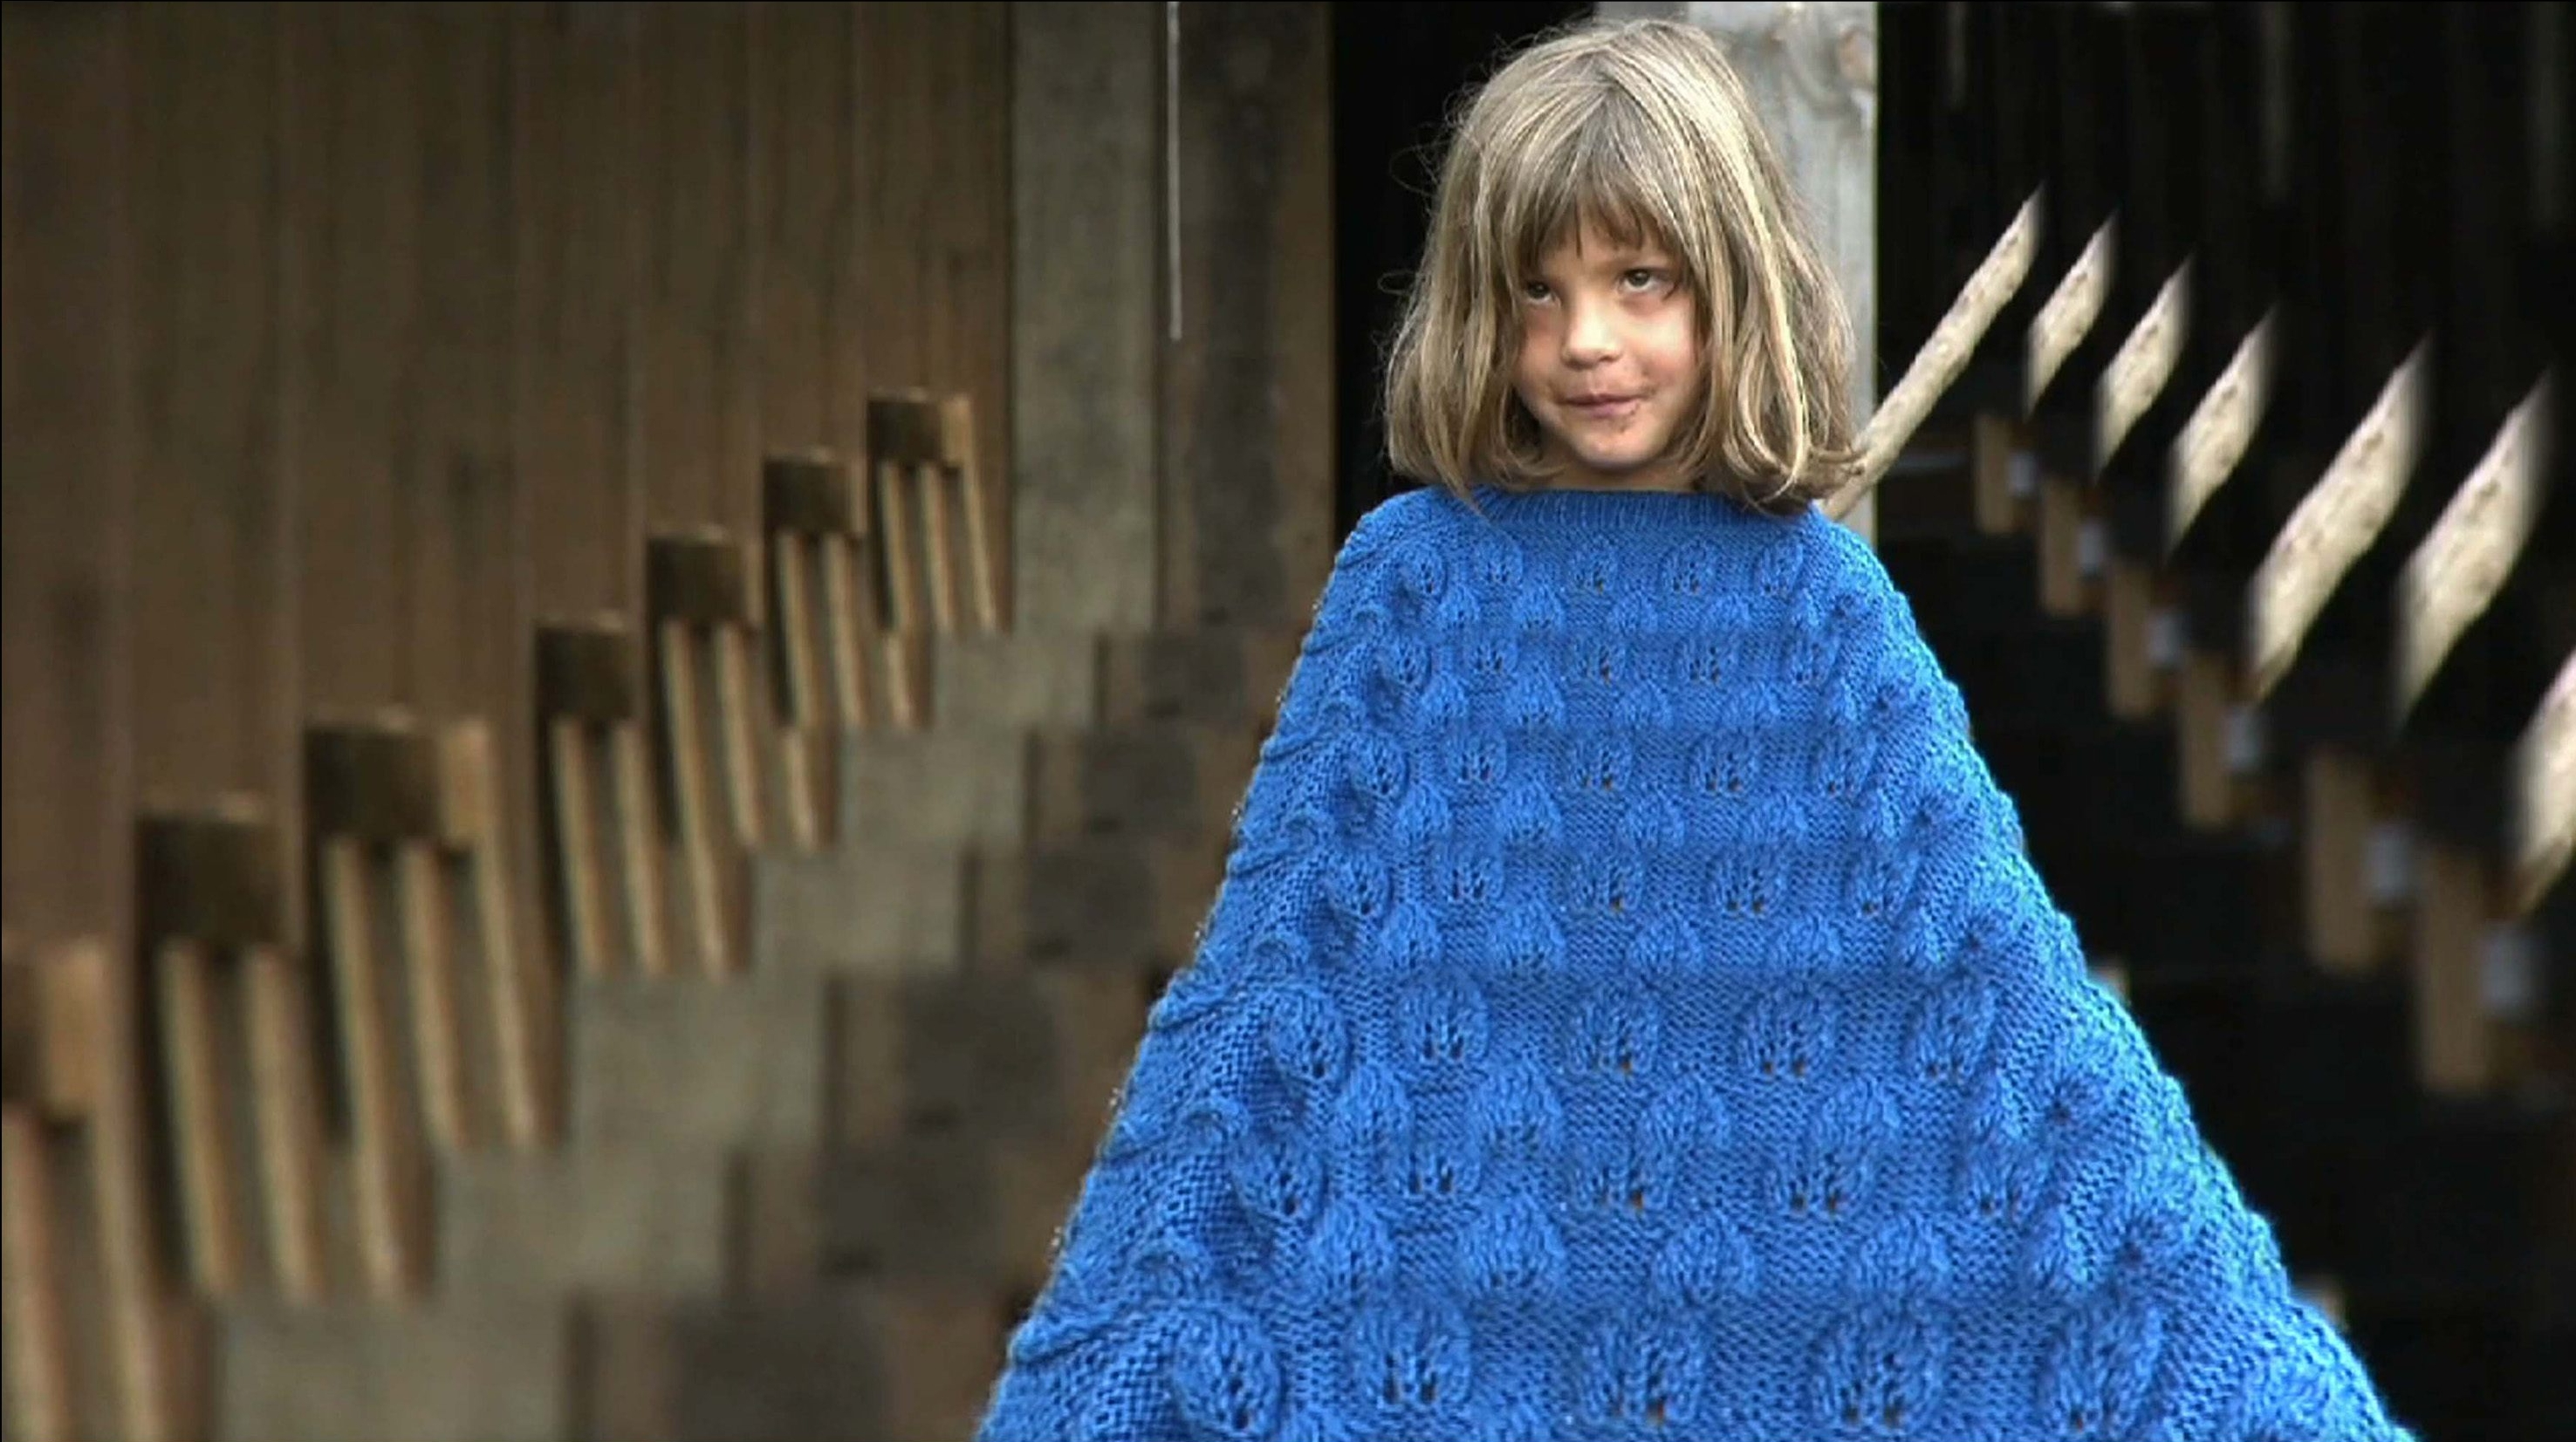 2_blusao azul